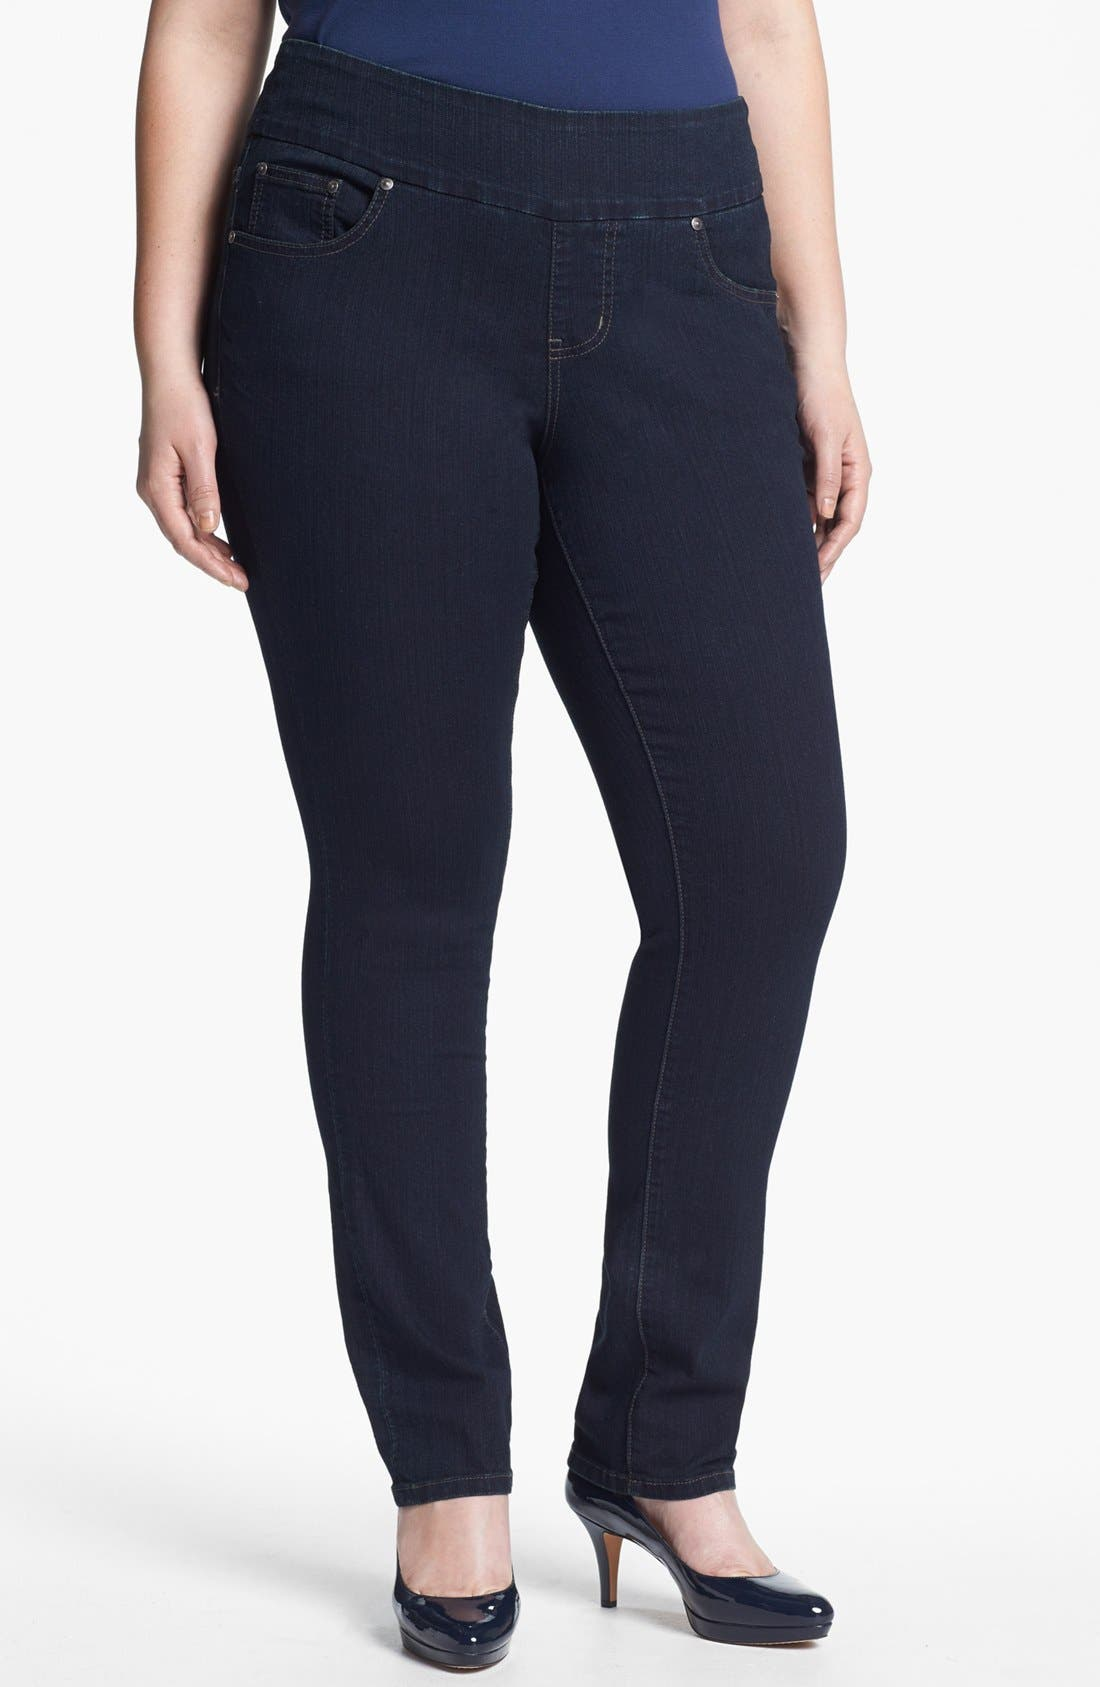 Main Image - Jag Jeans 'Malia' Slim Leg Jeans (Plus Size)